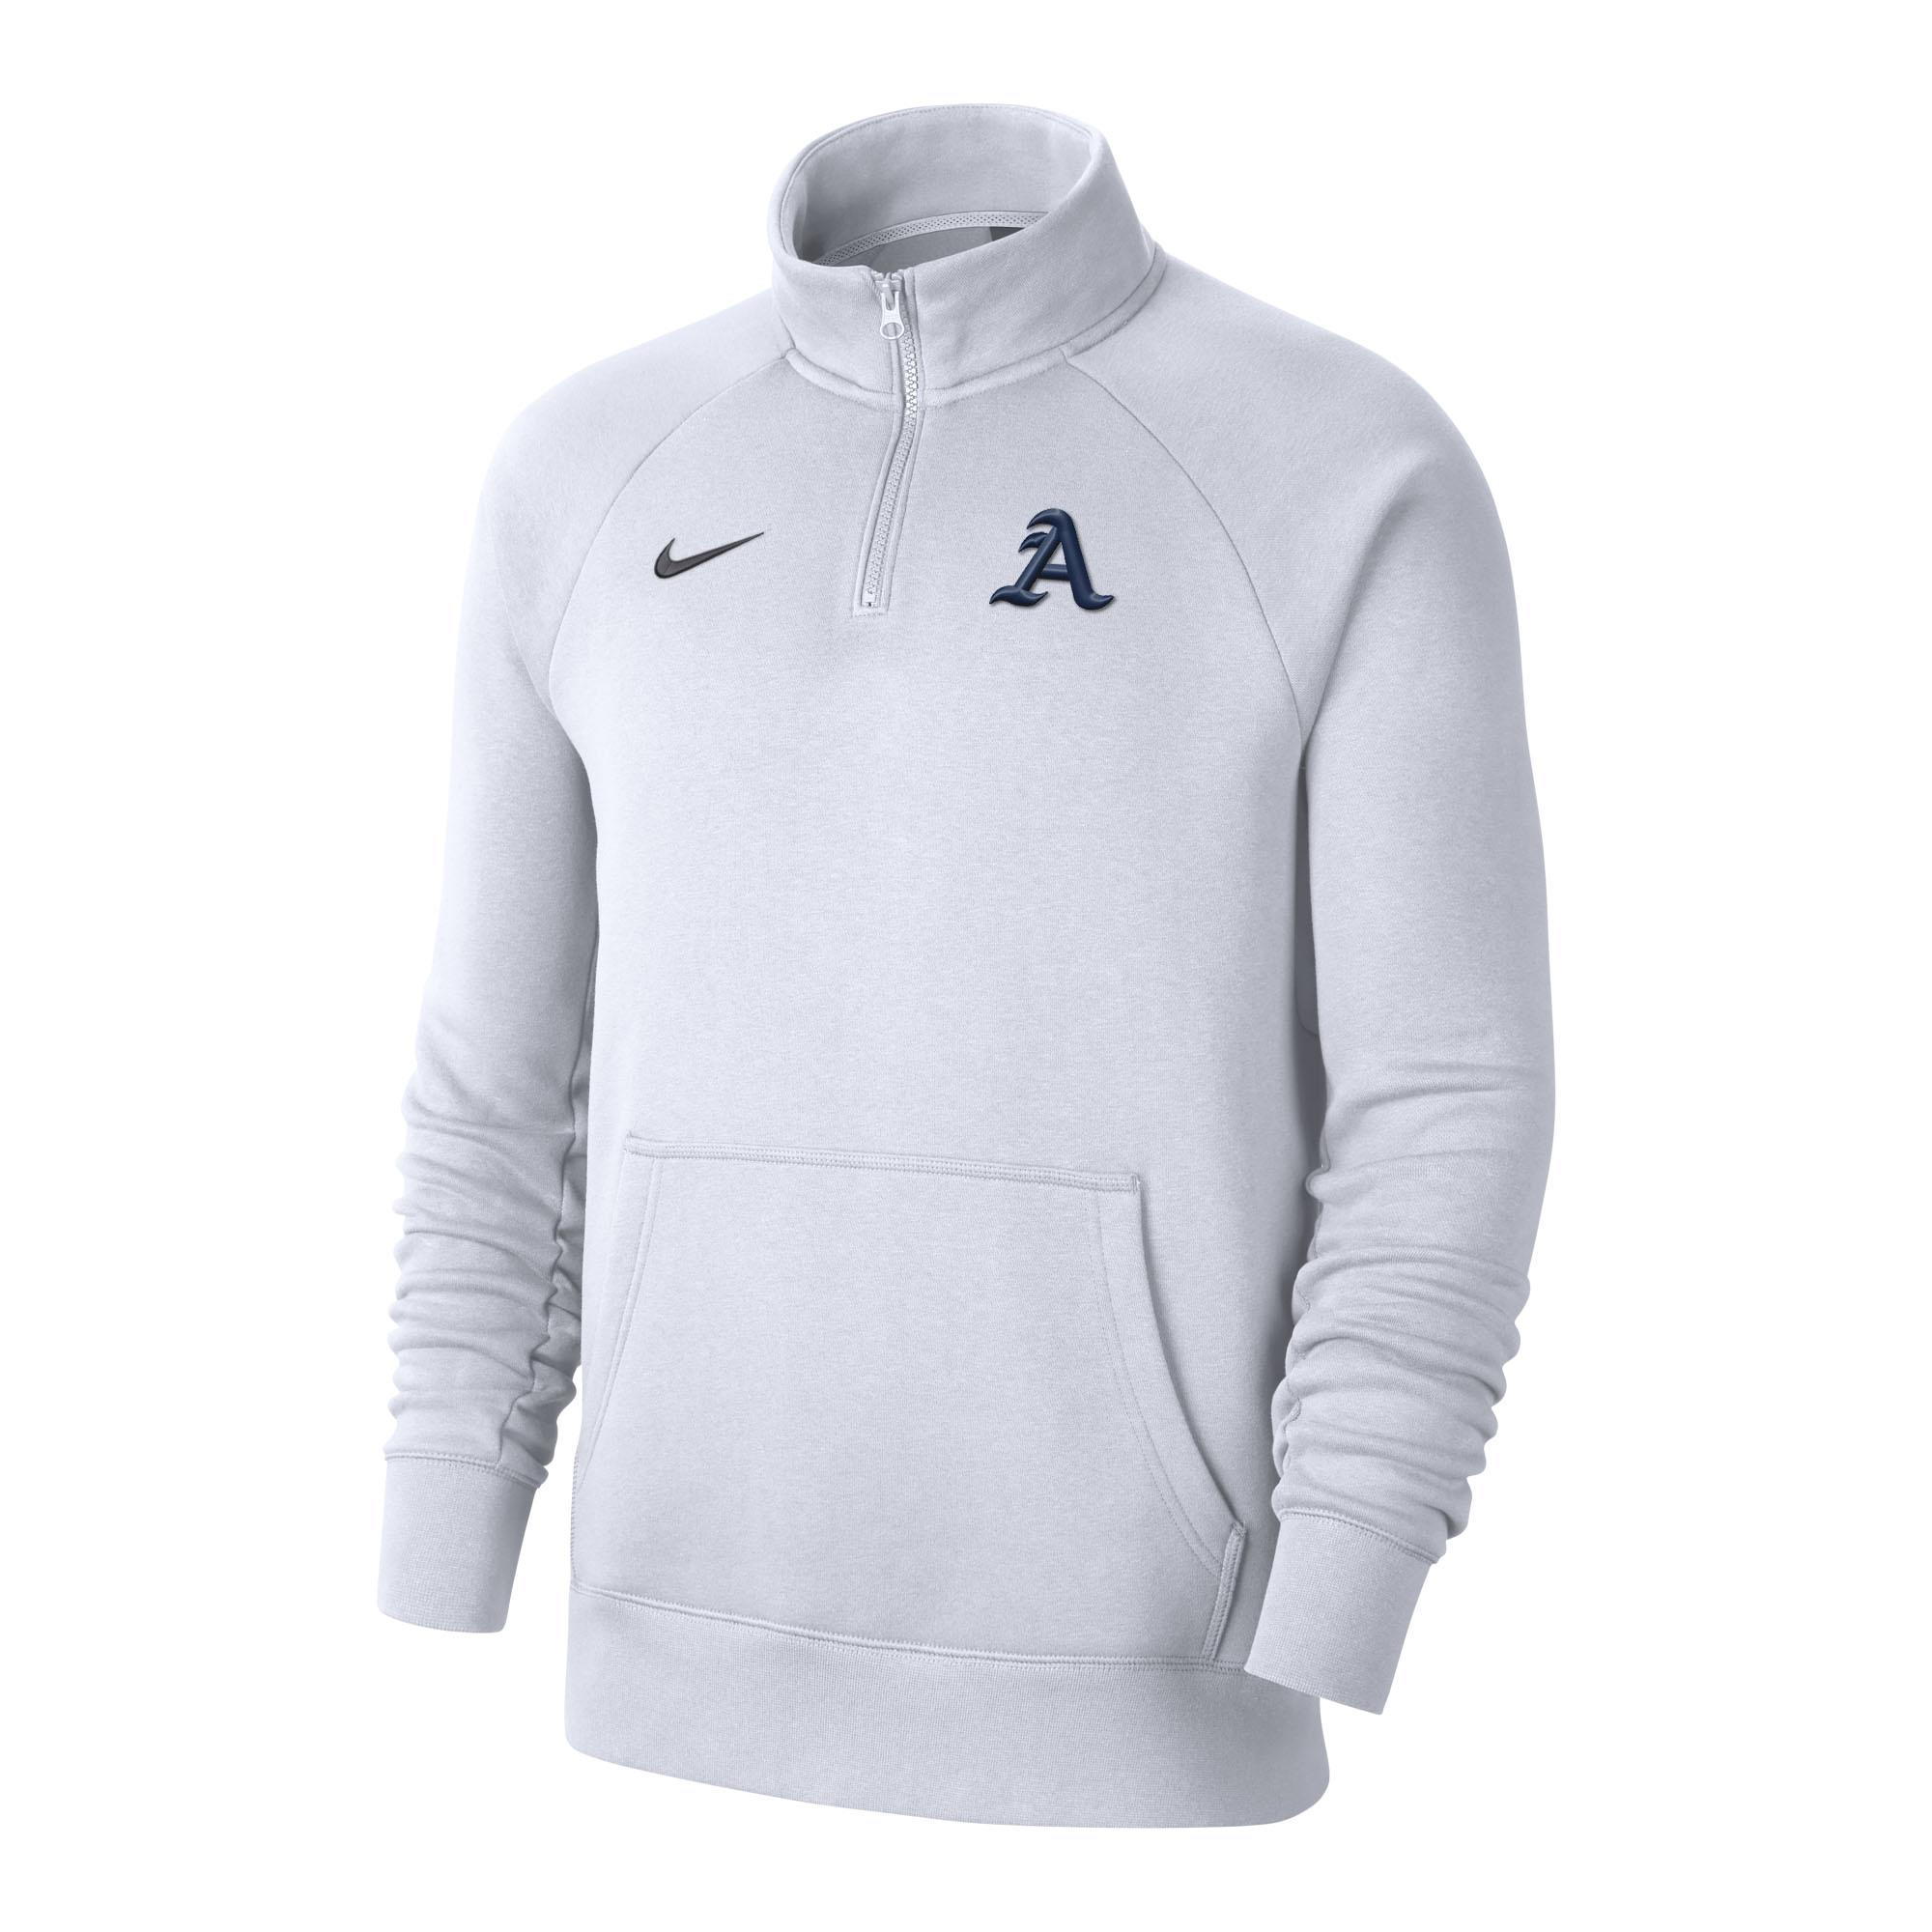 Nike 2021-22 Club Fleece 1/4 zip White